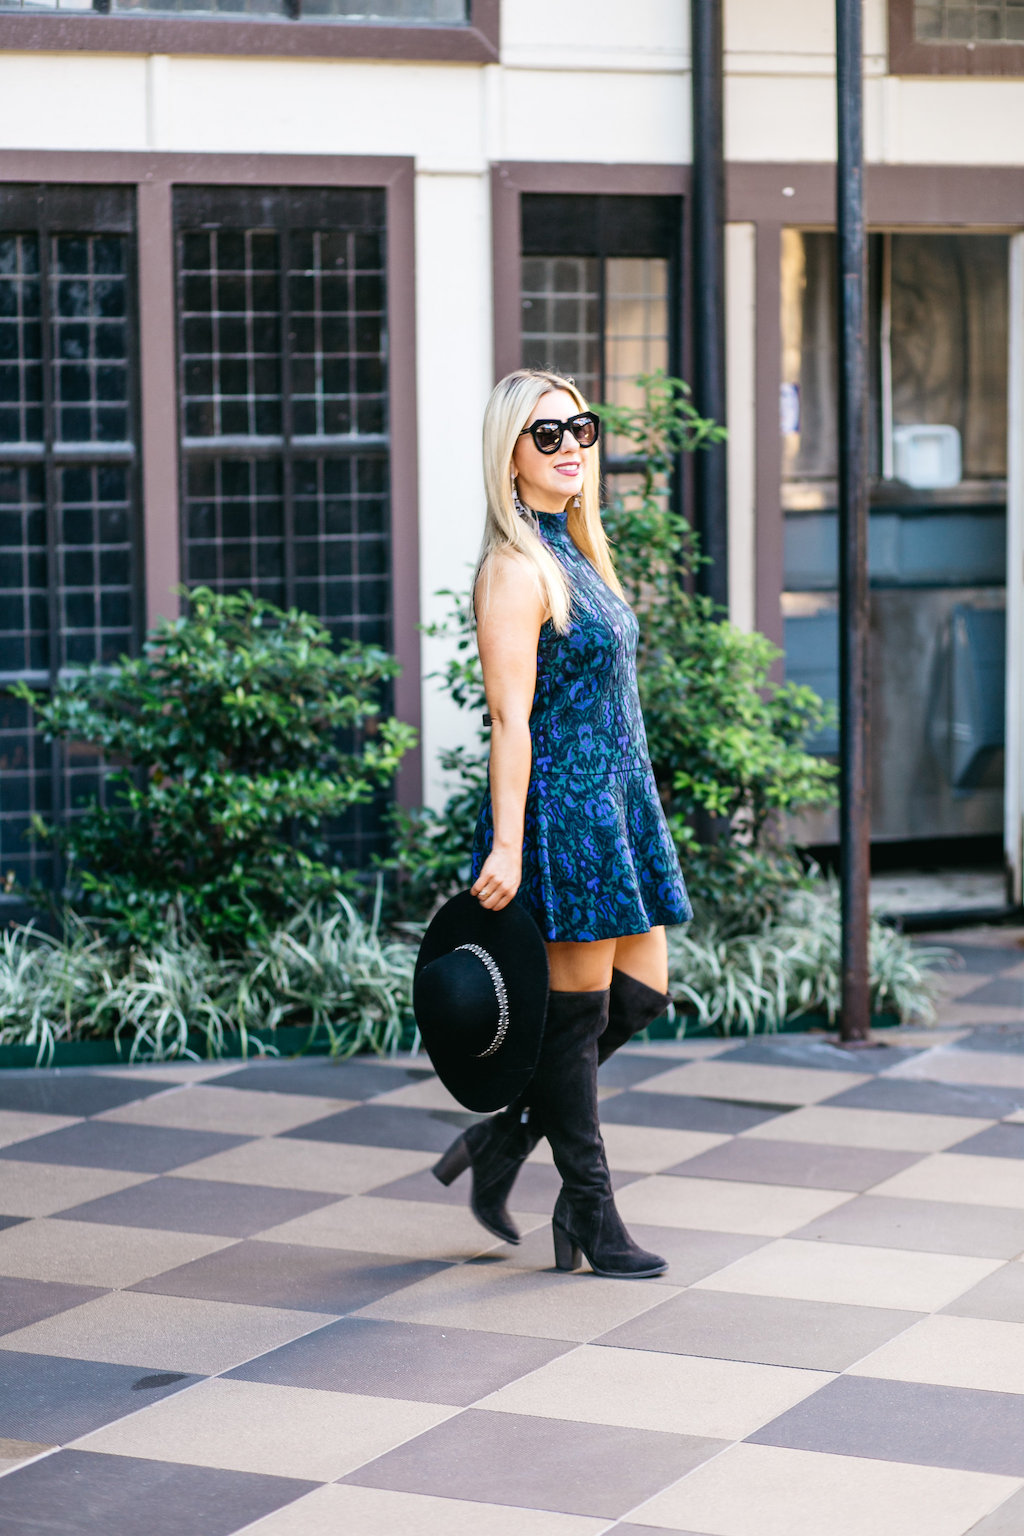 Boho Chic + OTK's| Dallas Fashion